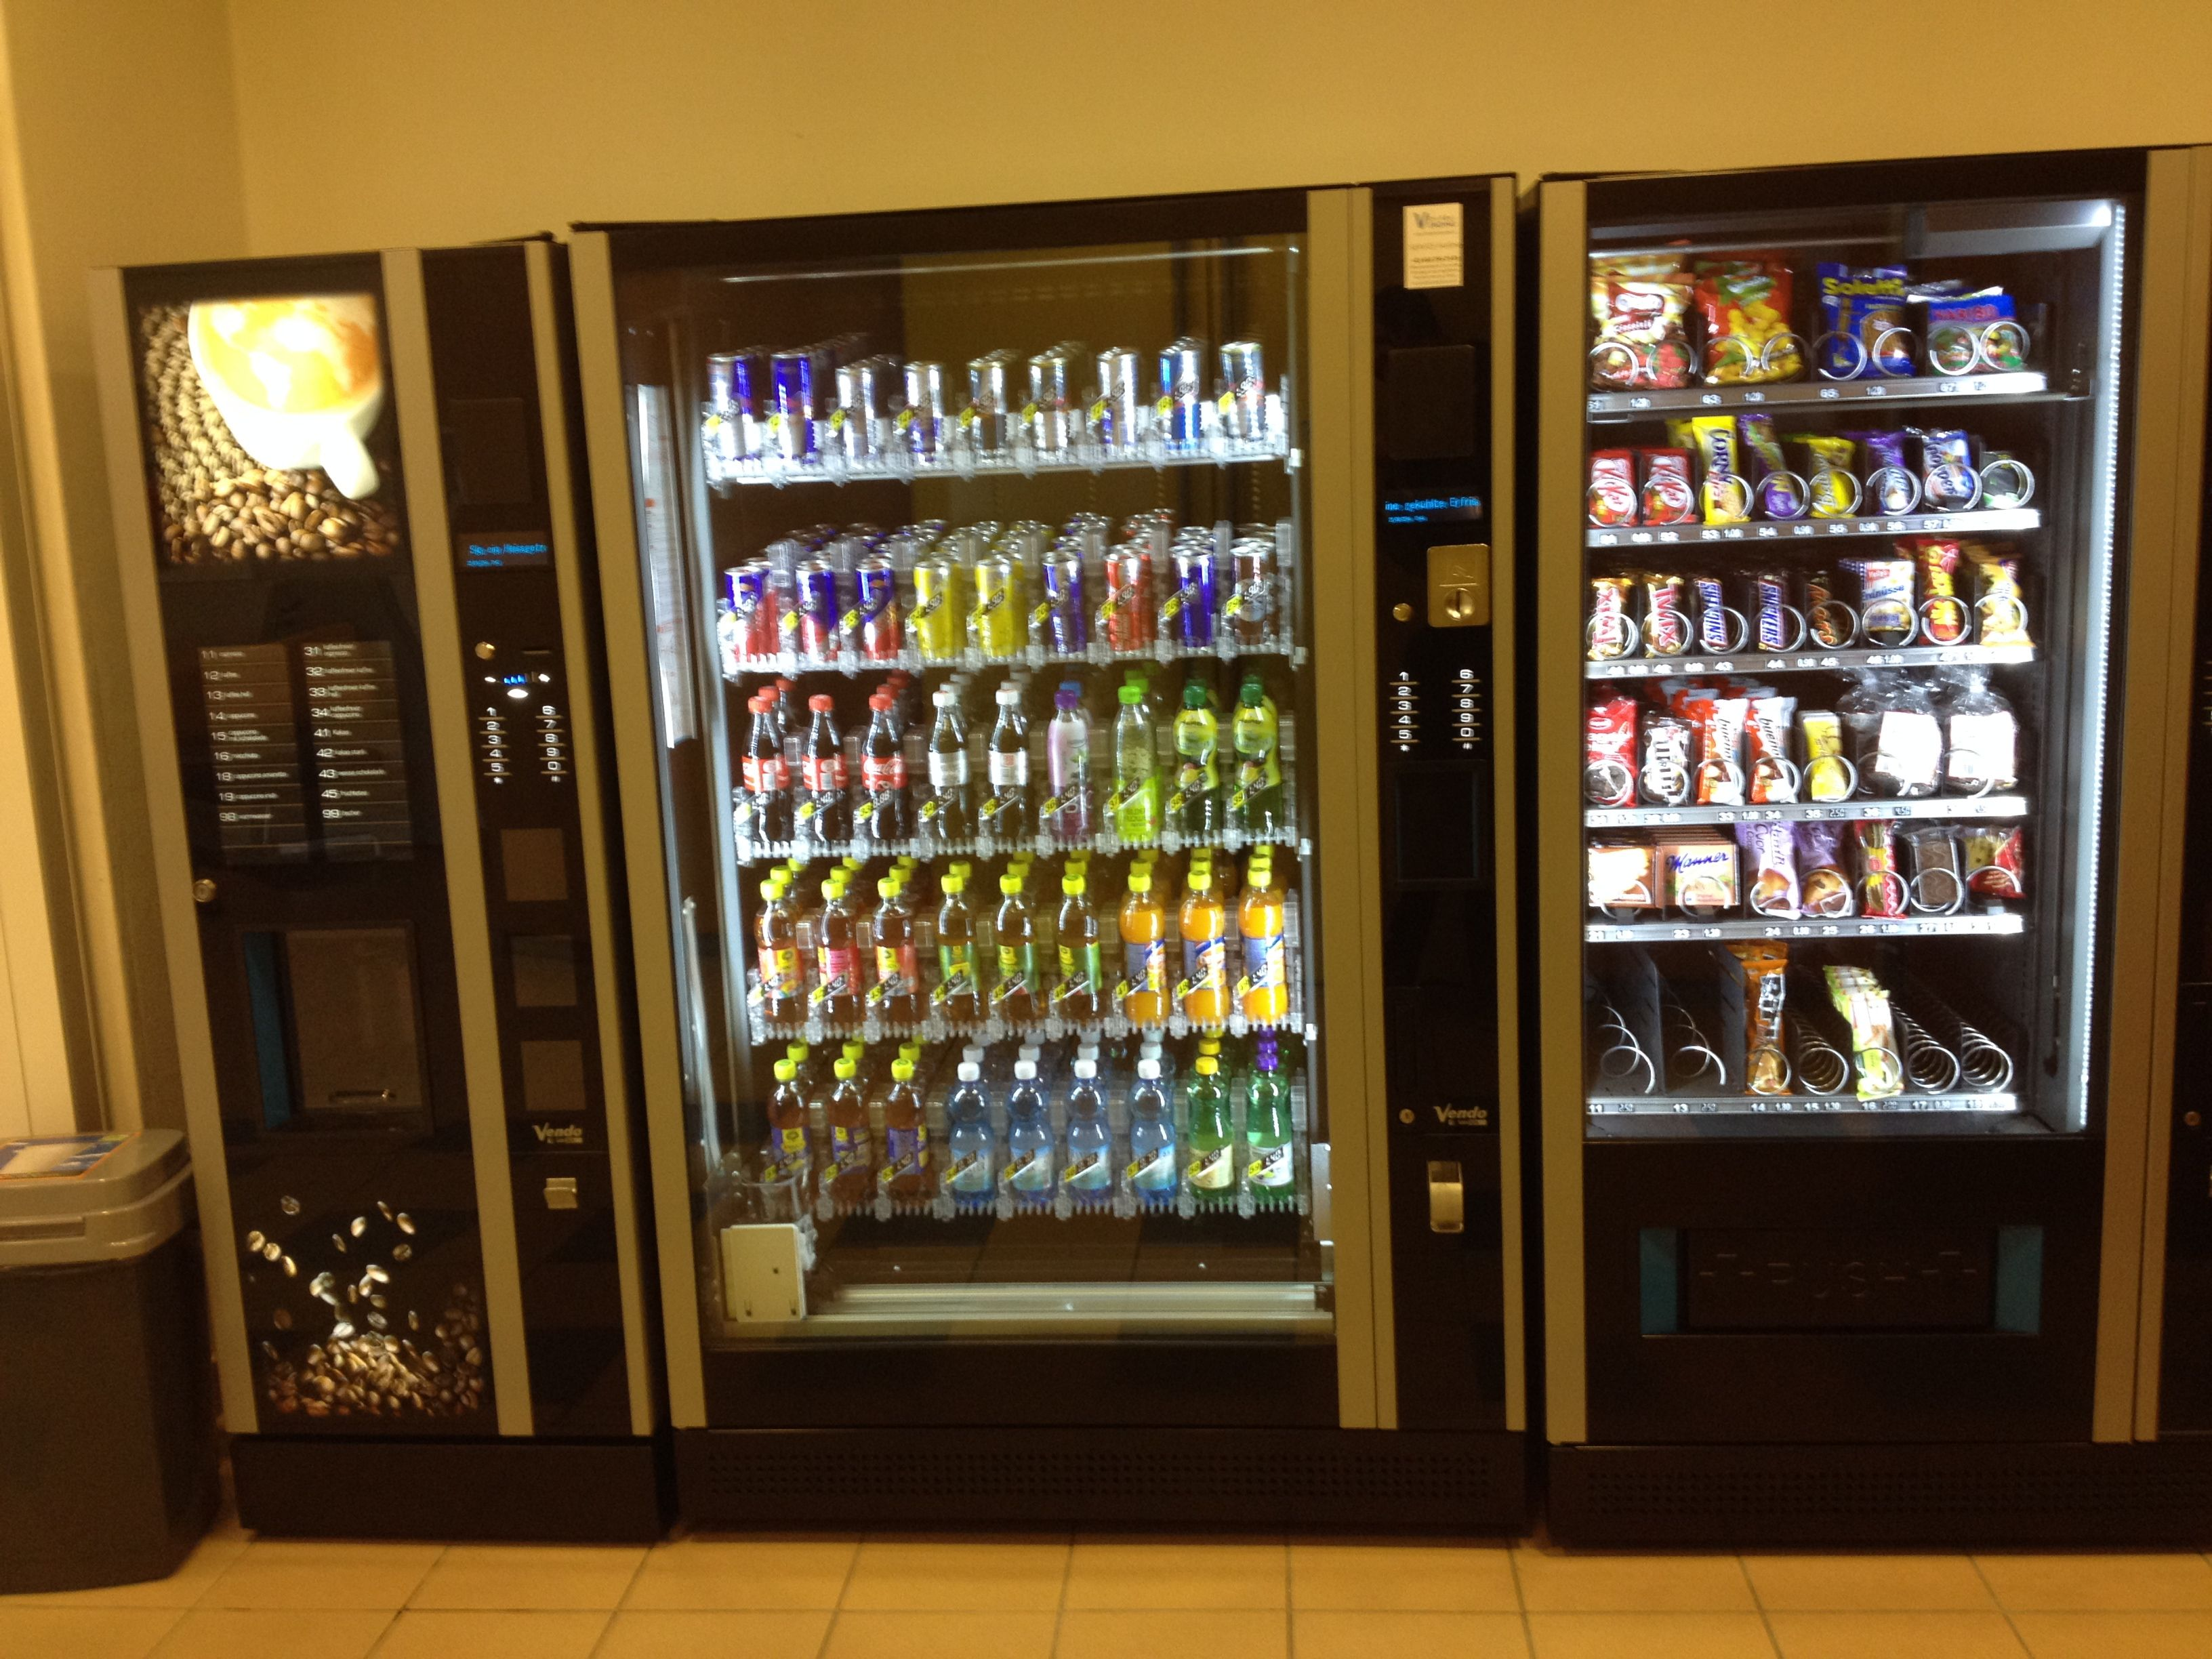 Outdoor Sielaff CIS 500; Instant Coffee Machine #drinksandsnacks   VENDING    Pinterest